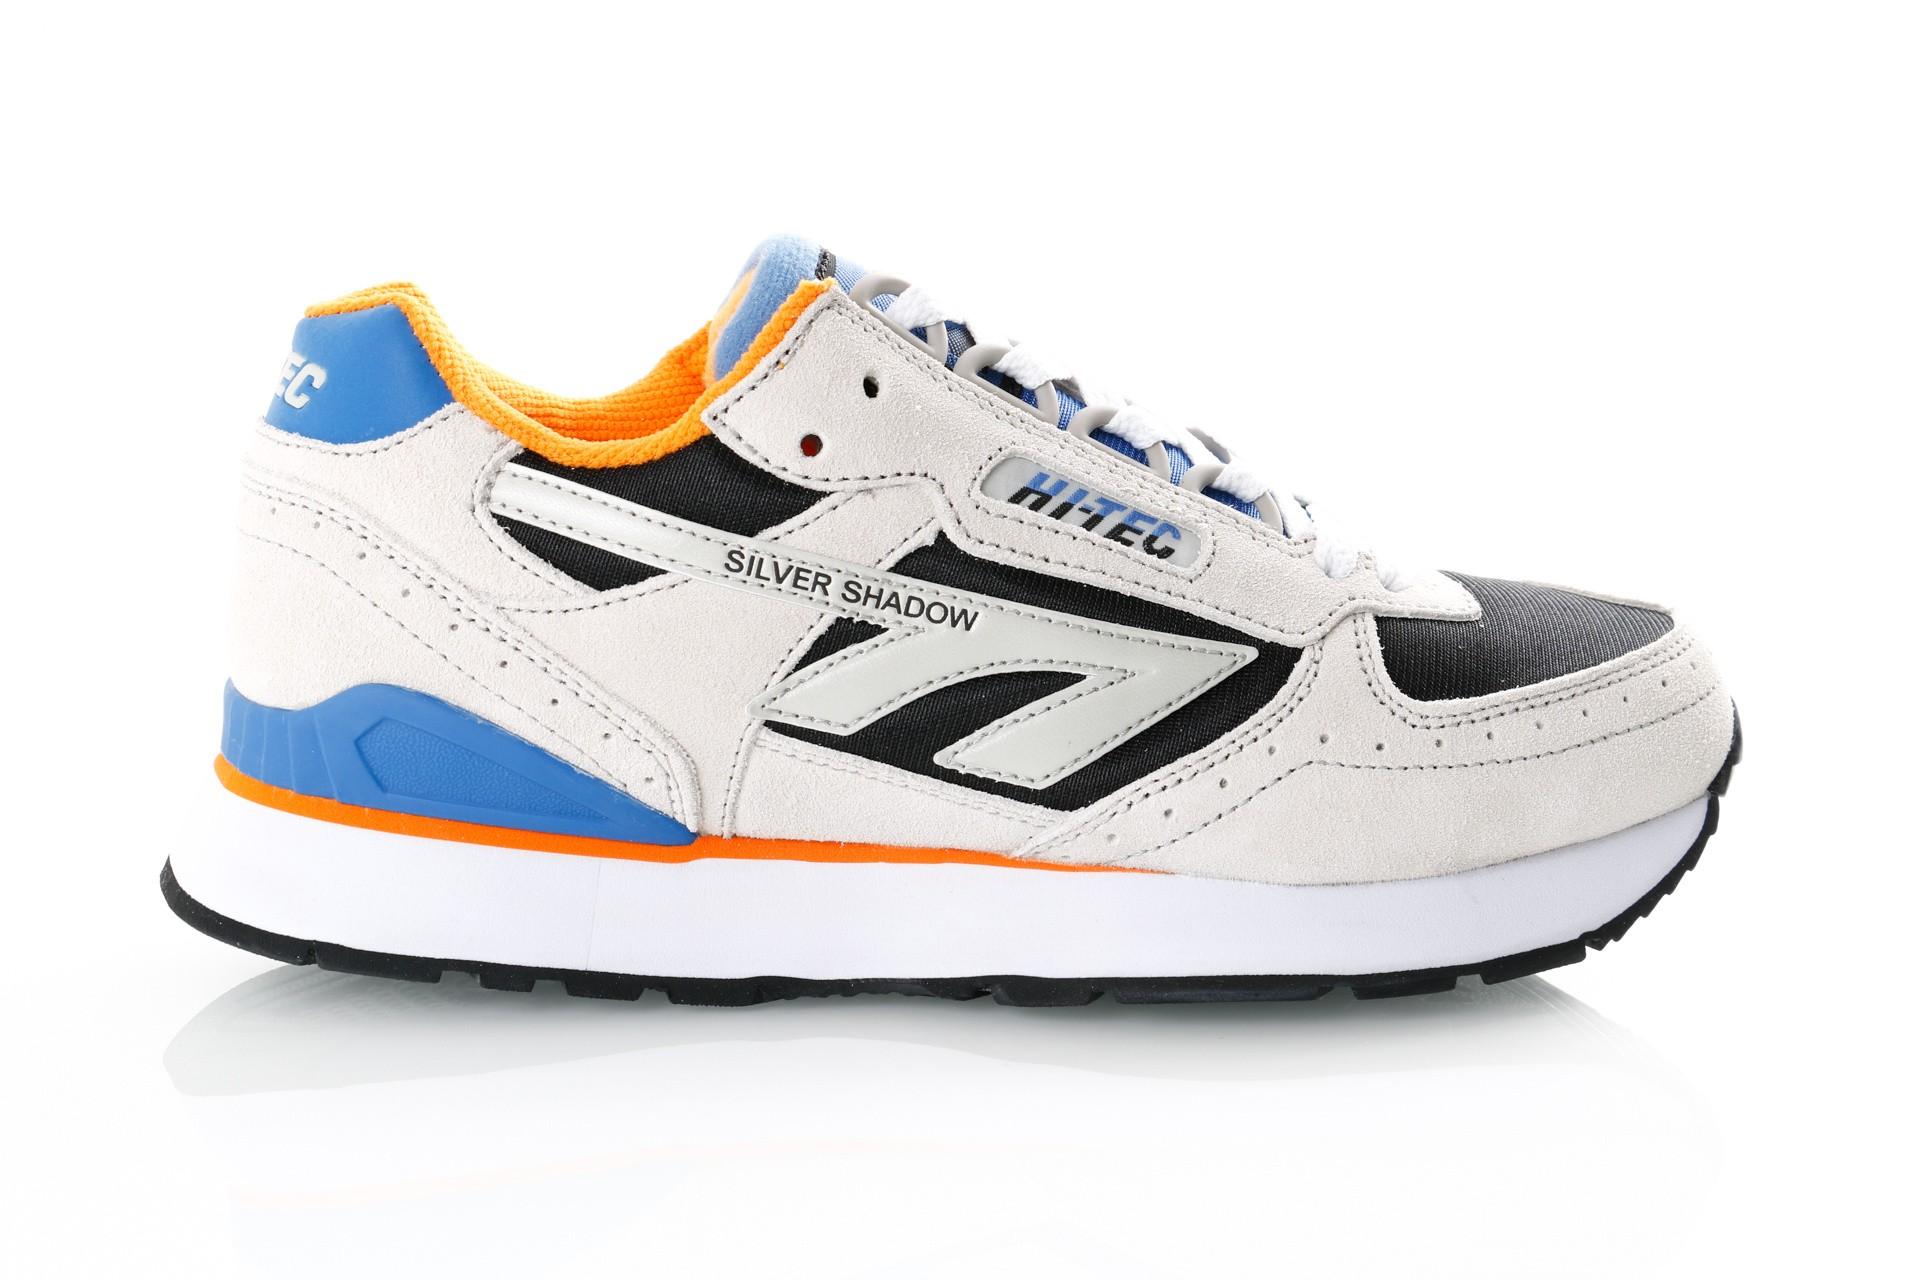 Foto van Hi-Tec Silver Shadow S010001/071 Sneakers Grey/ Black/Blue /Orange